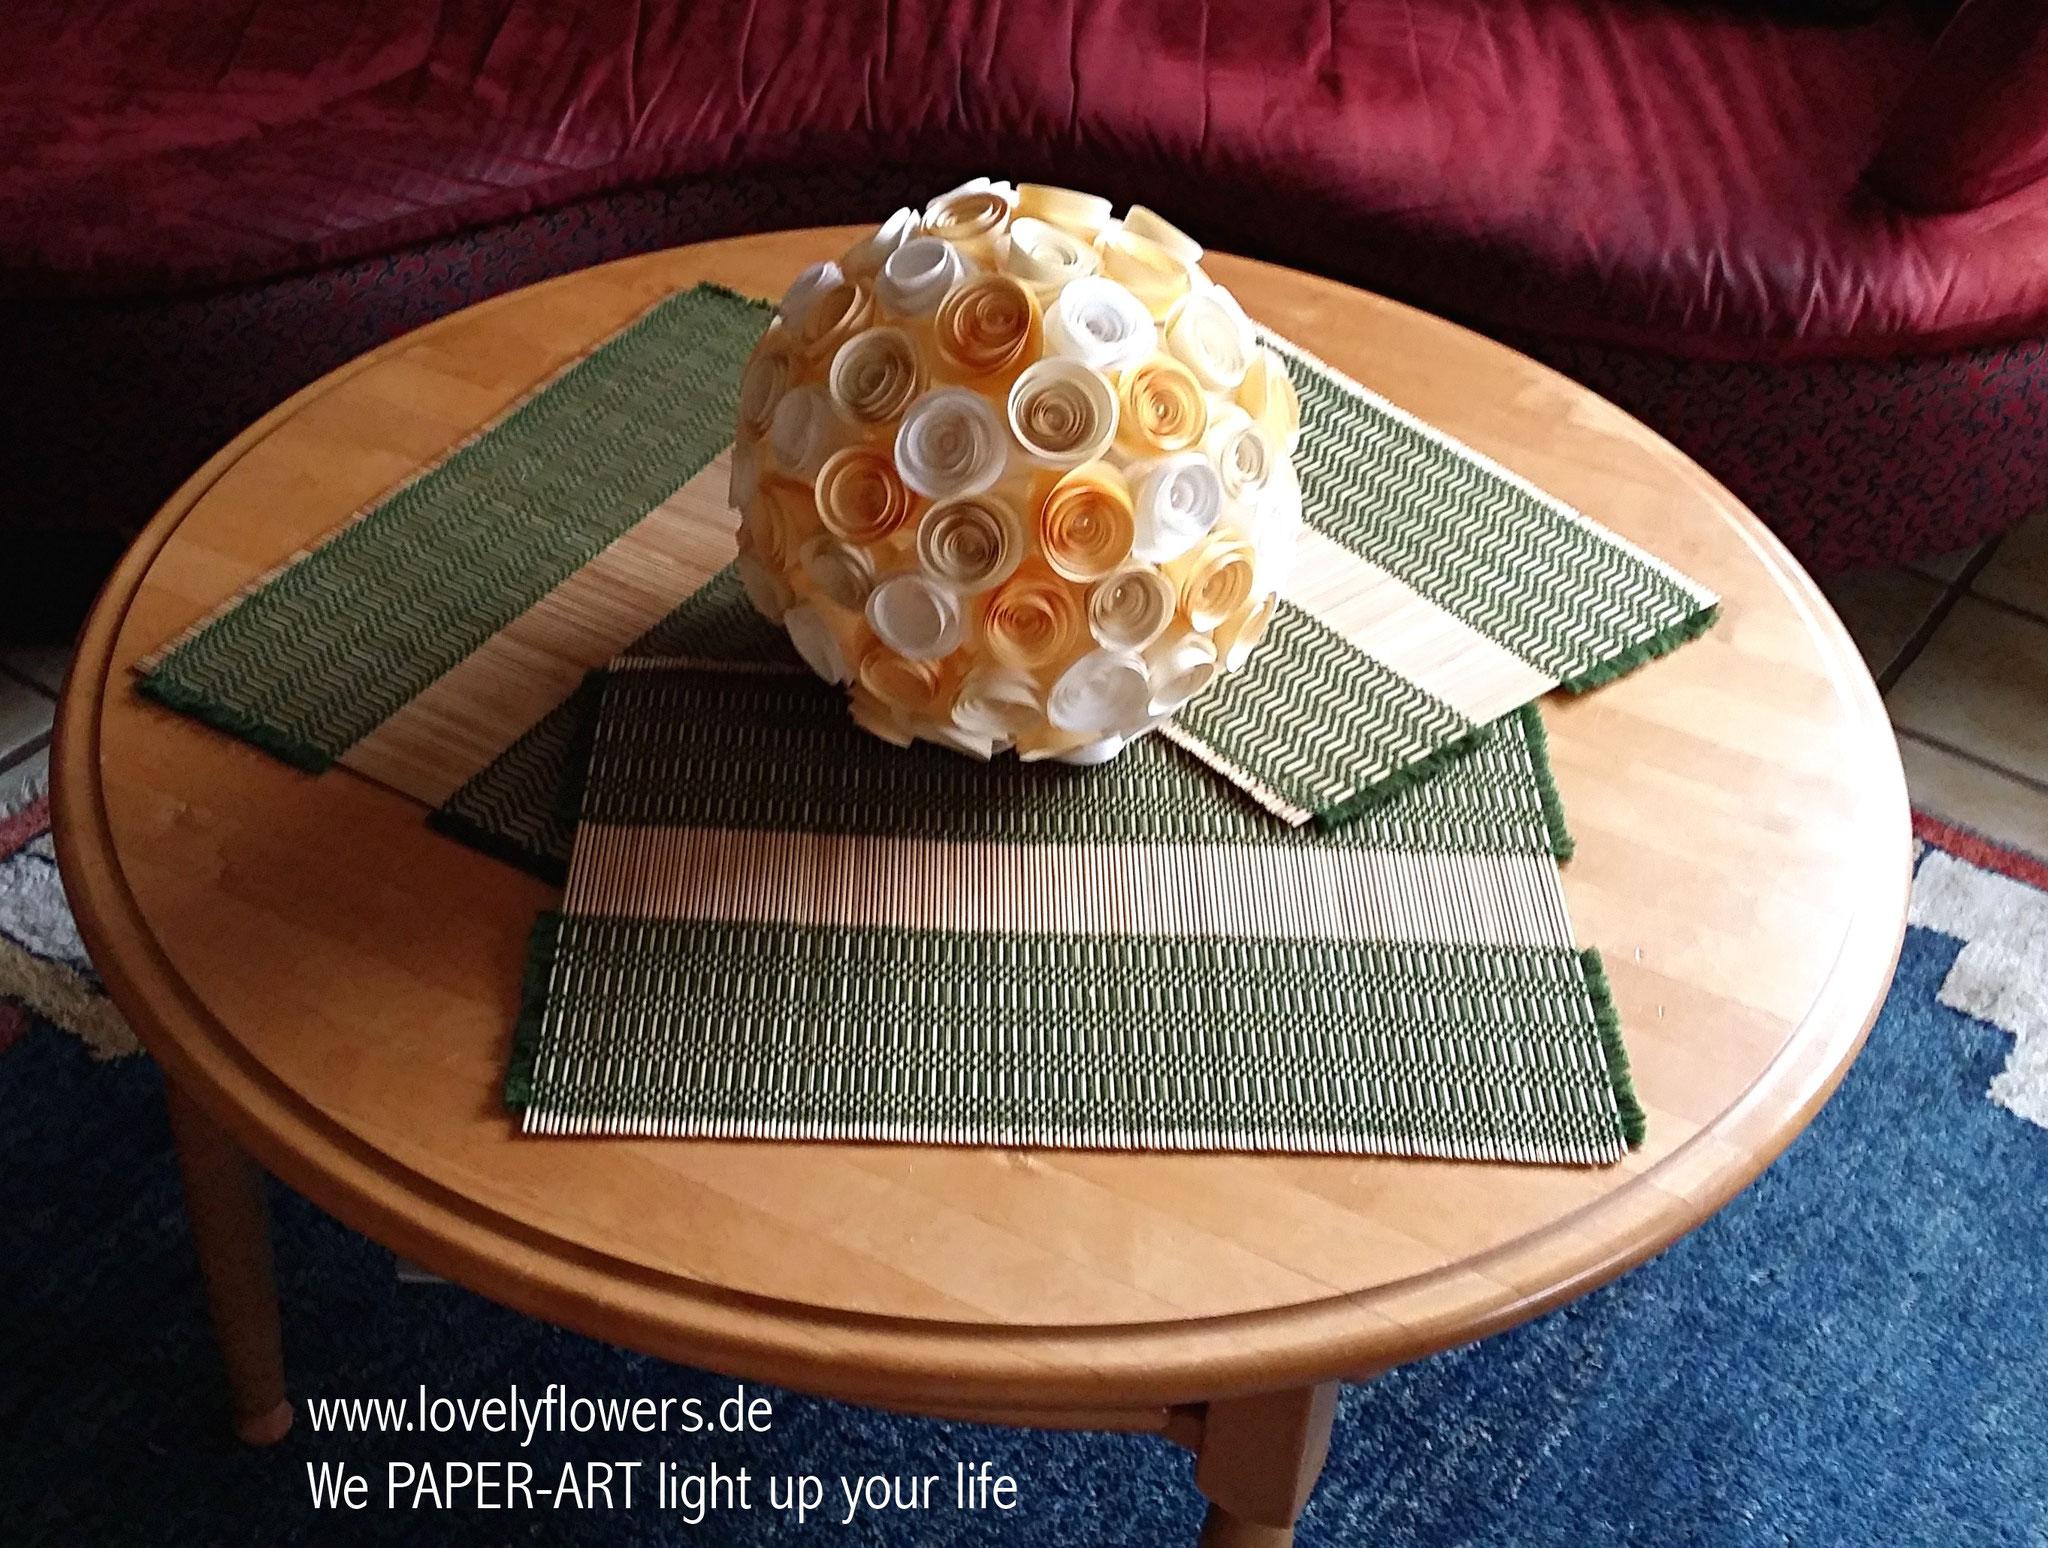 www.lovelyflowers.de - Paper Art Lampen verschönern jeden Tisch!